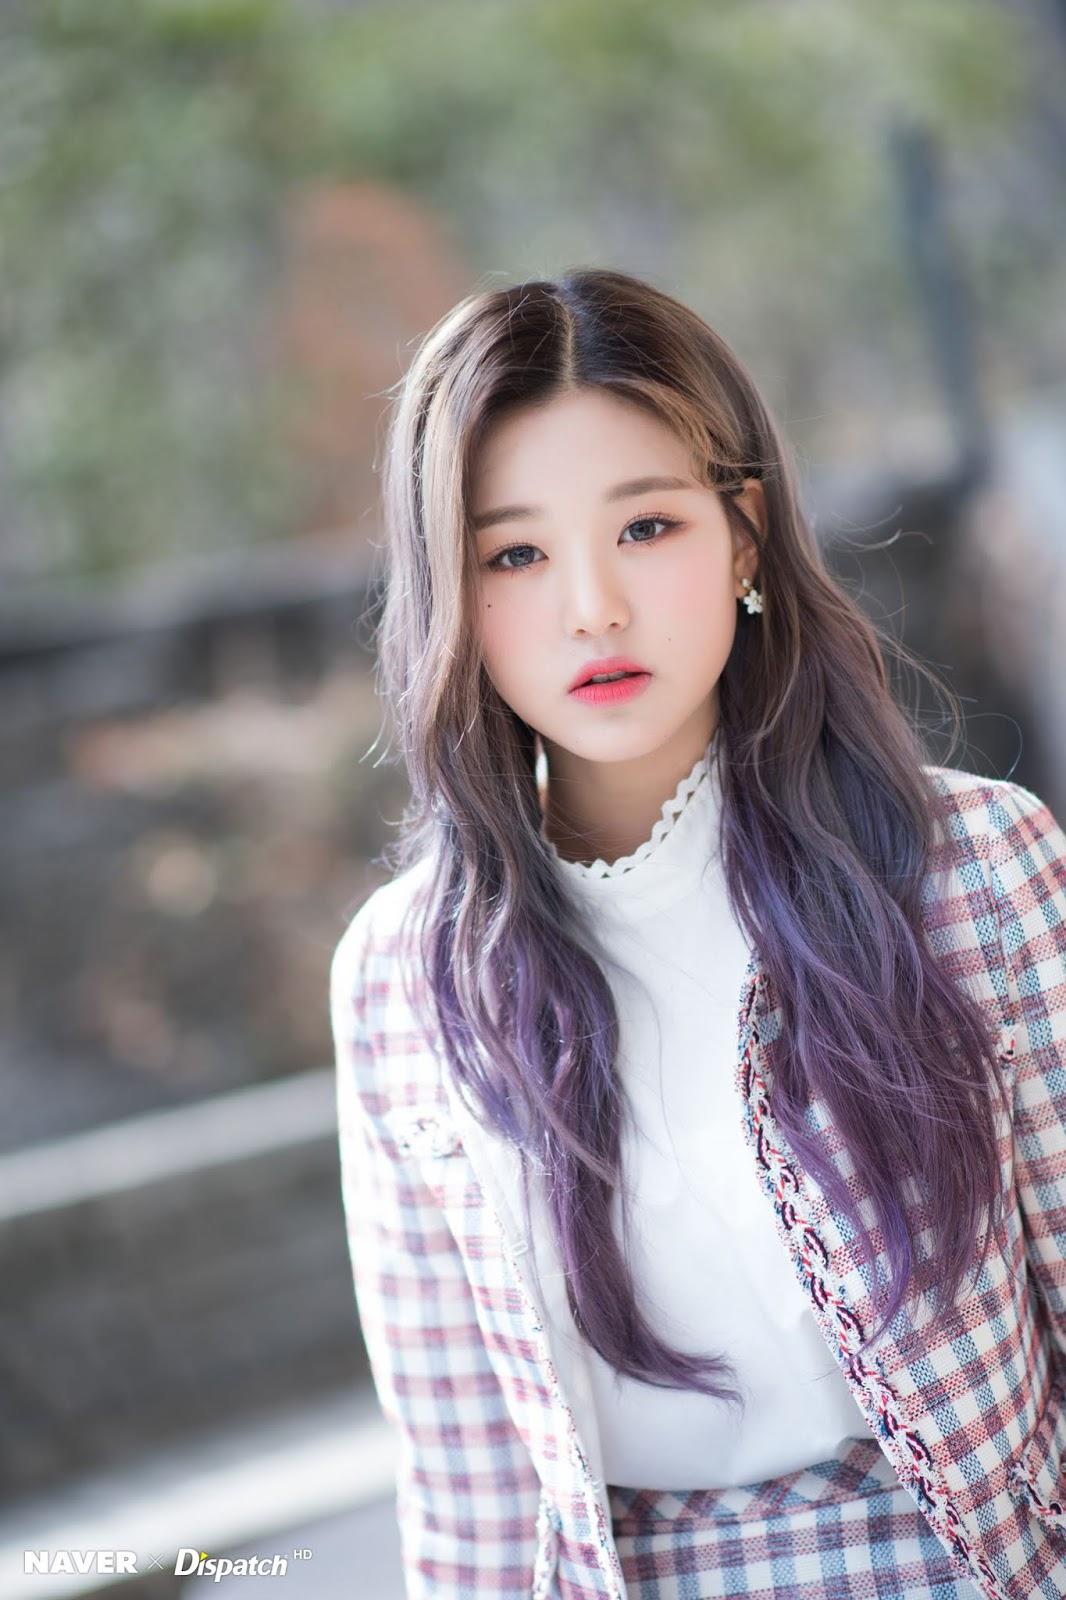 wonyoung pics on Twitter: 180904 © wonderful days #장원영